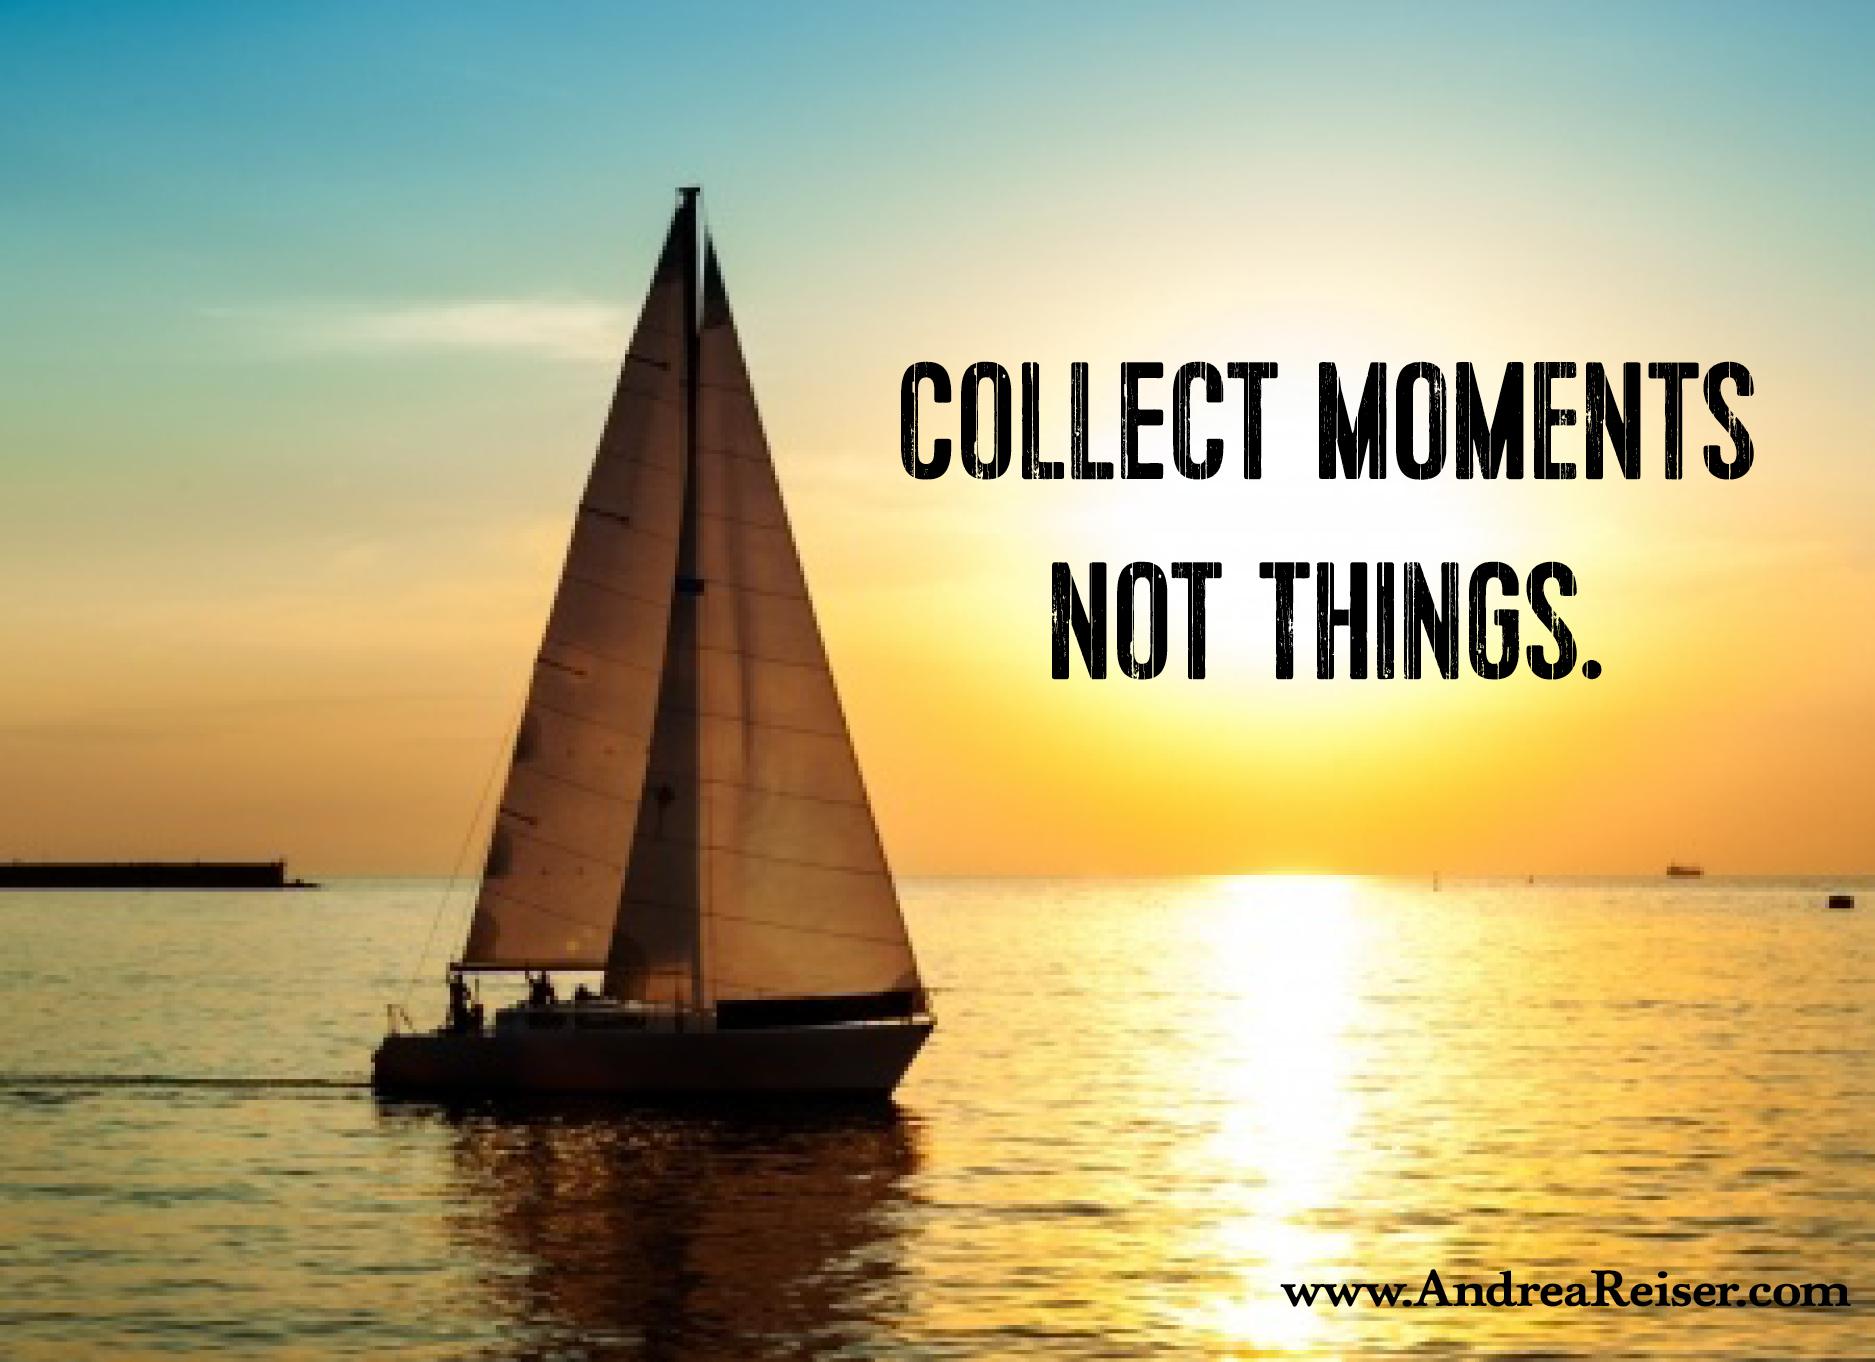 Collect Moments Not Things - Andrea Reiser Andrea Reiser